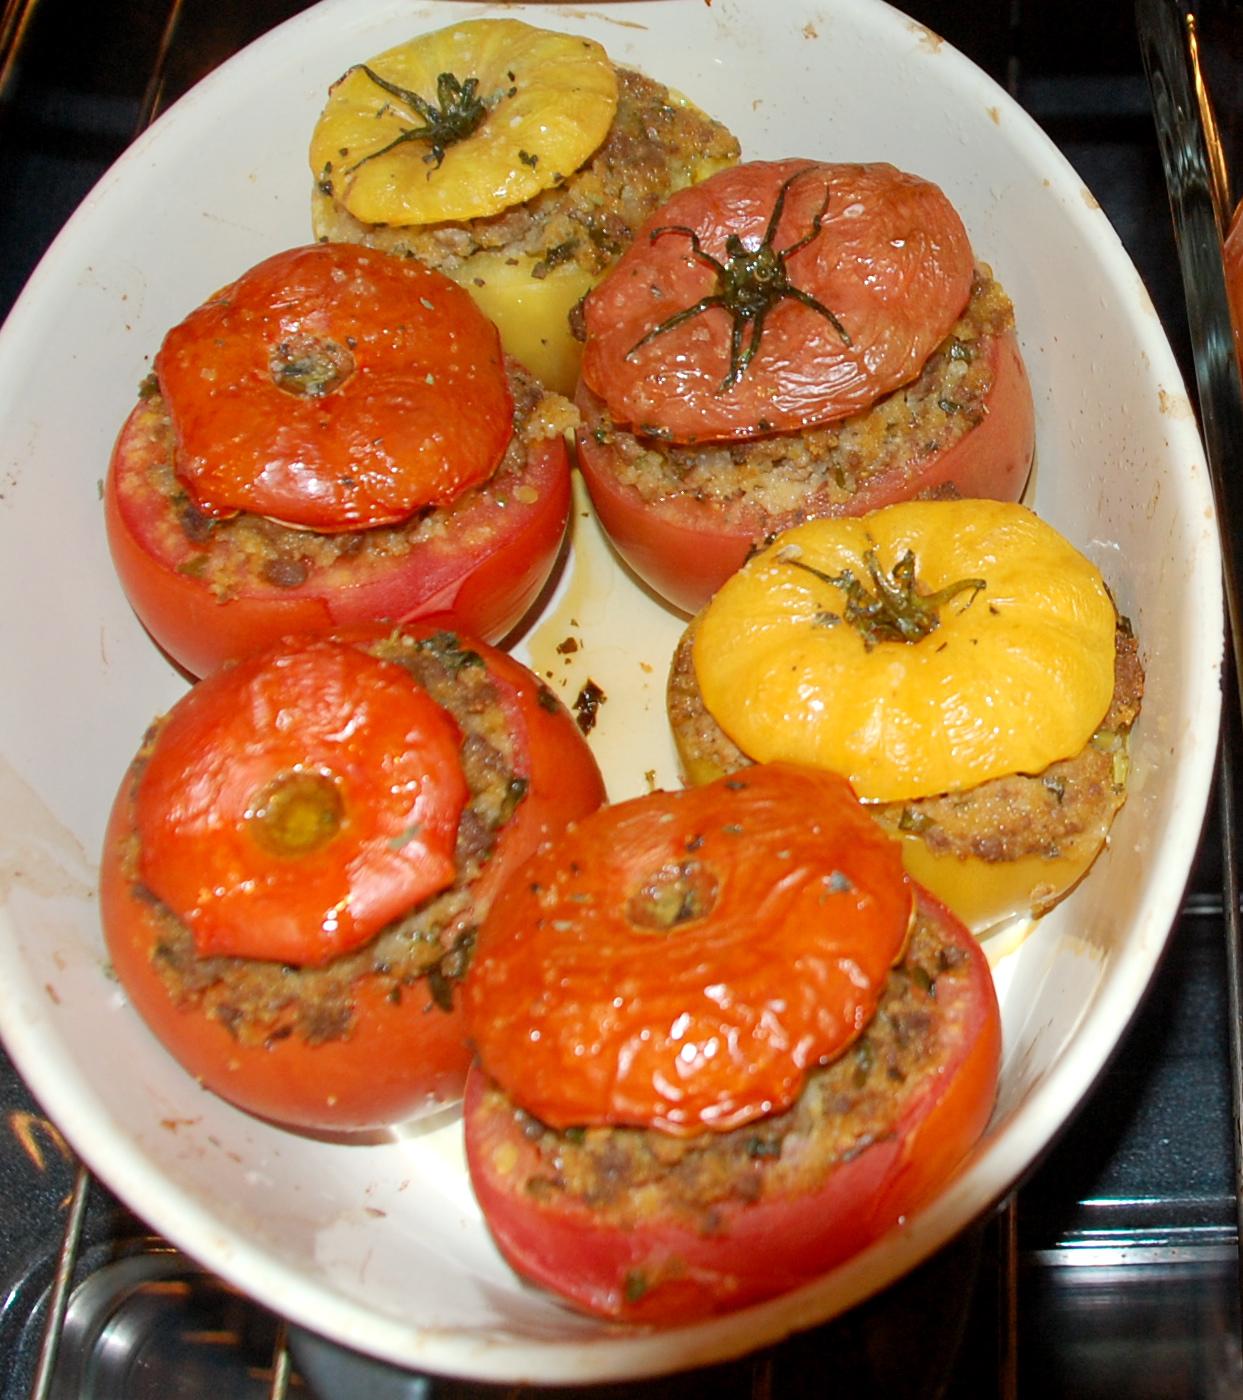 tomates farcies:  vegetarian & beef stuffed tomatoes, bonus QUINOA salad